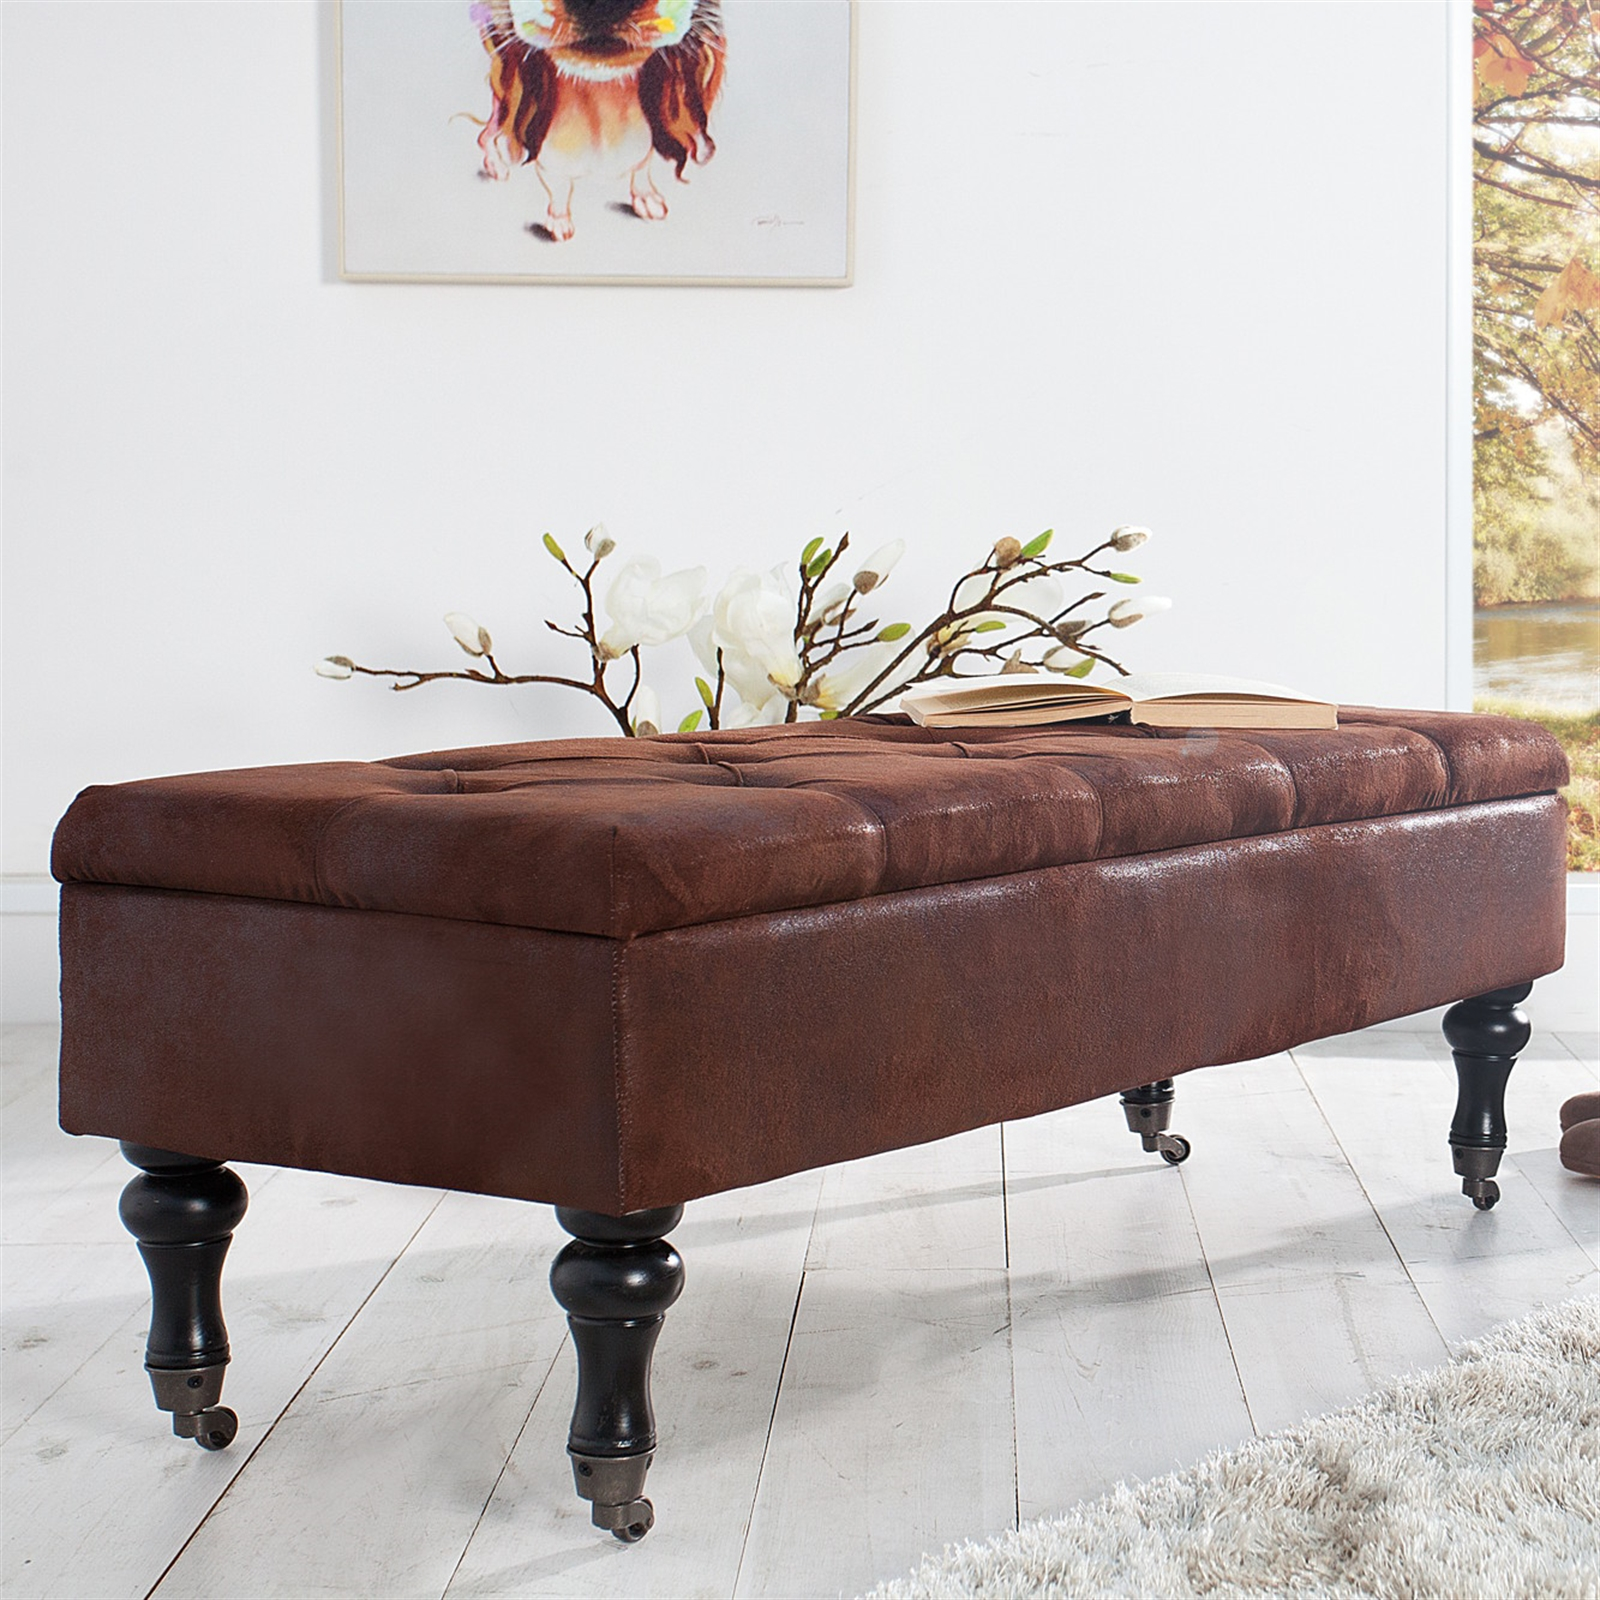 design sitzbank oxford vintage antikbraun 110 cm stauraum truhenbank ebay. Black Bedroom Furniture Sets. Home Design Ideas